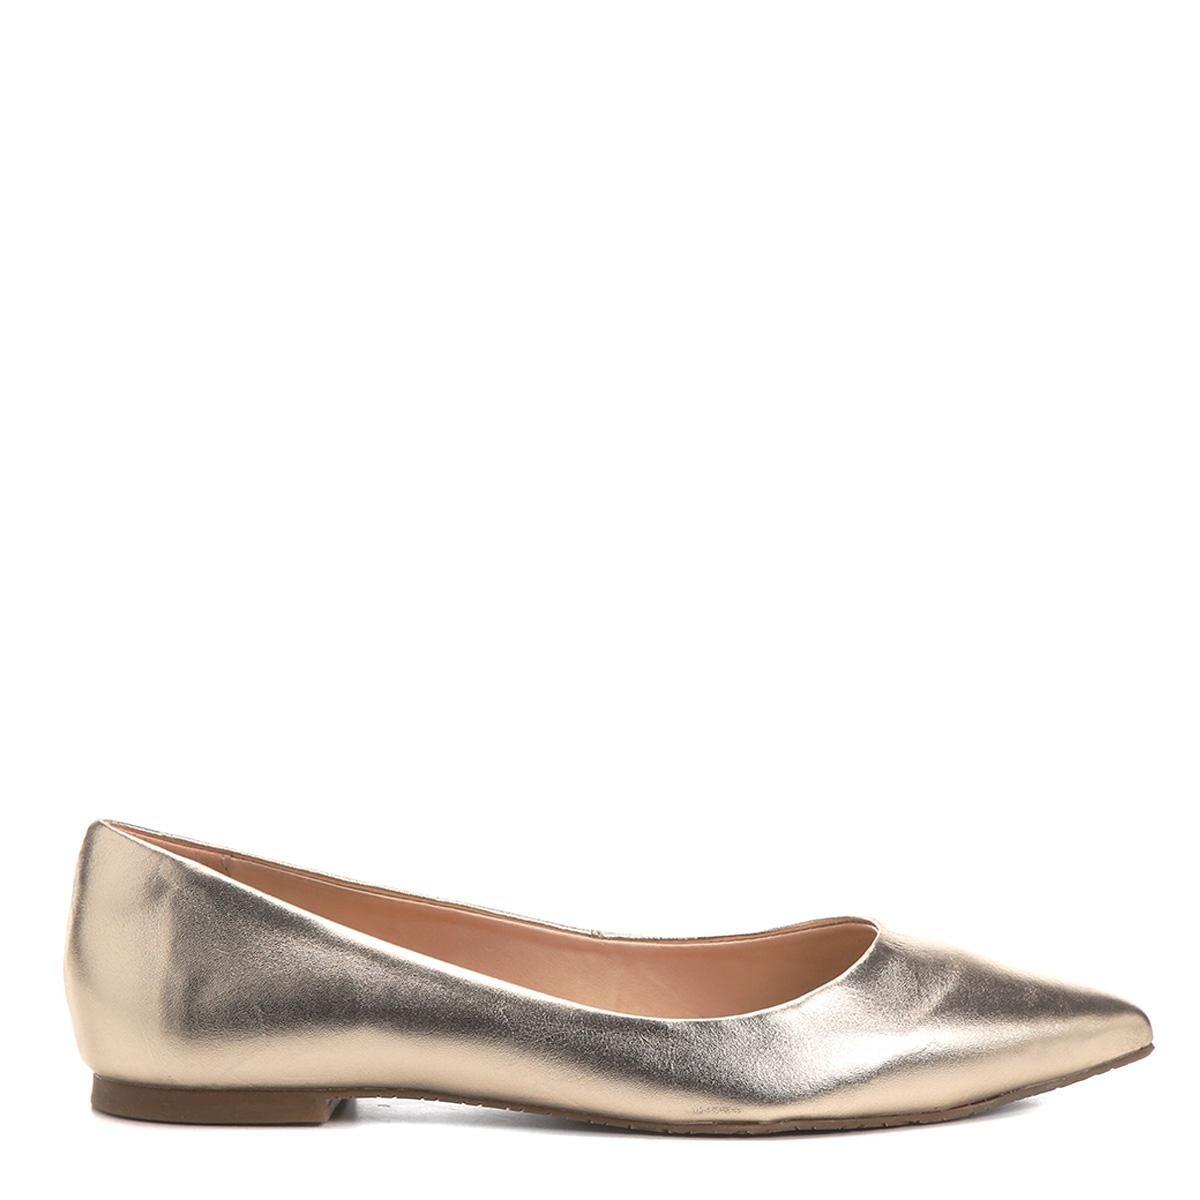 aef9a35777 sapatilha couro shoestock bico fino metalizada feminina. Carregando zoom.